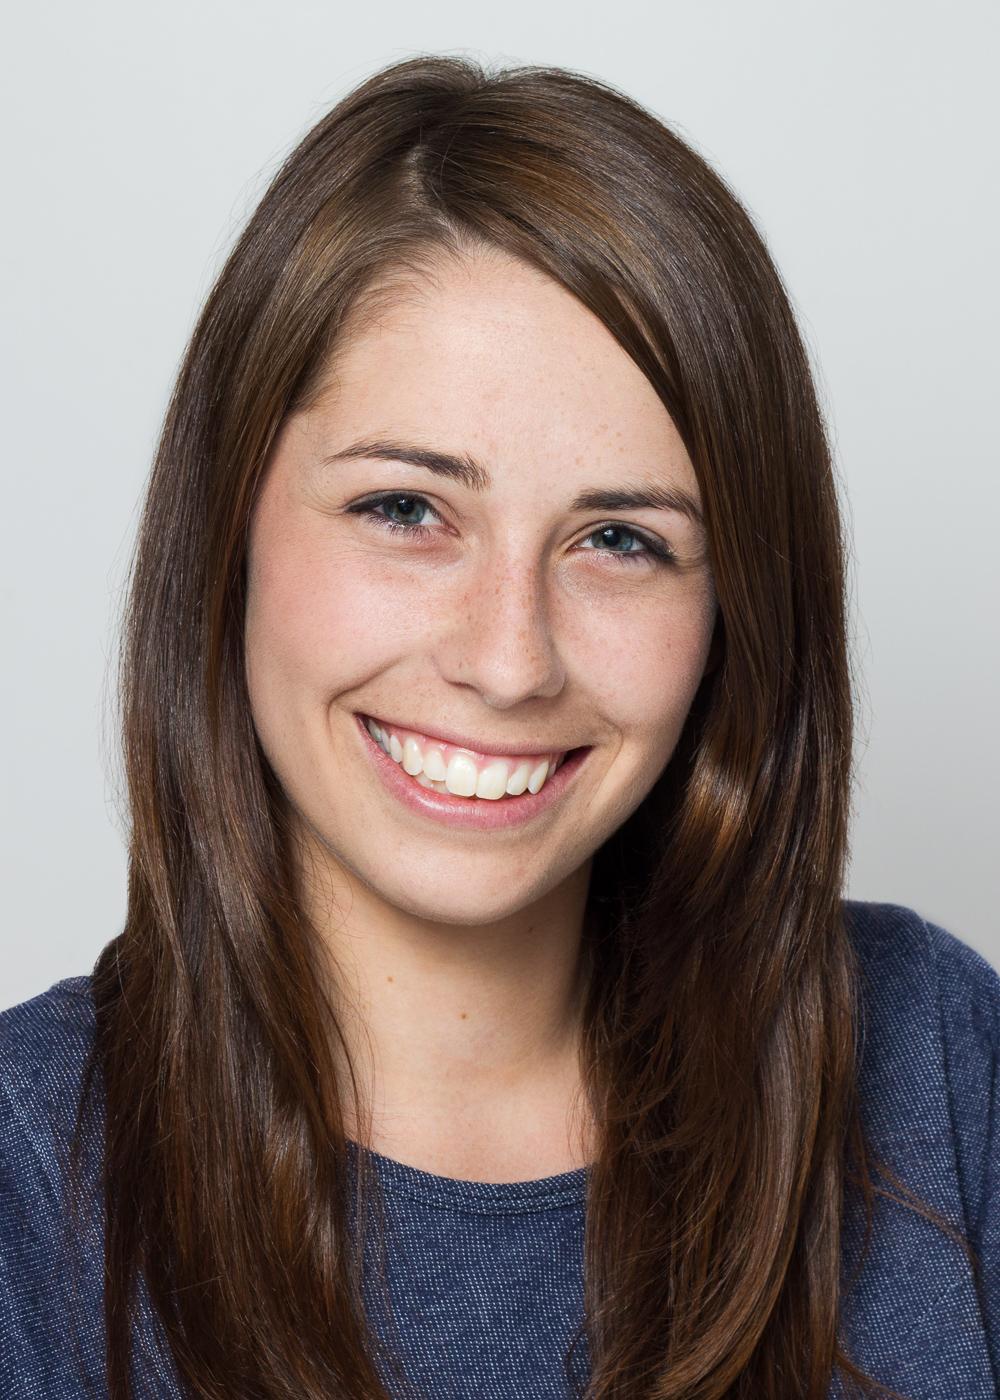 Julia Rothamel